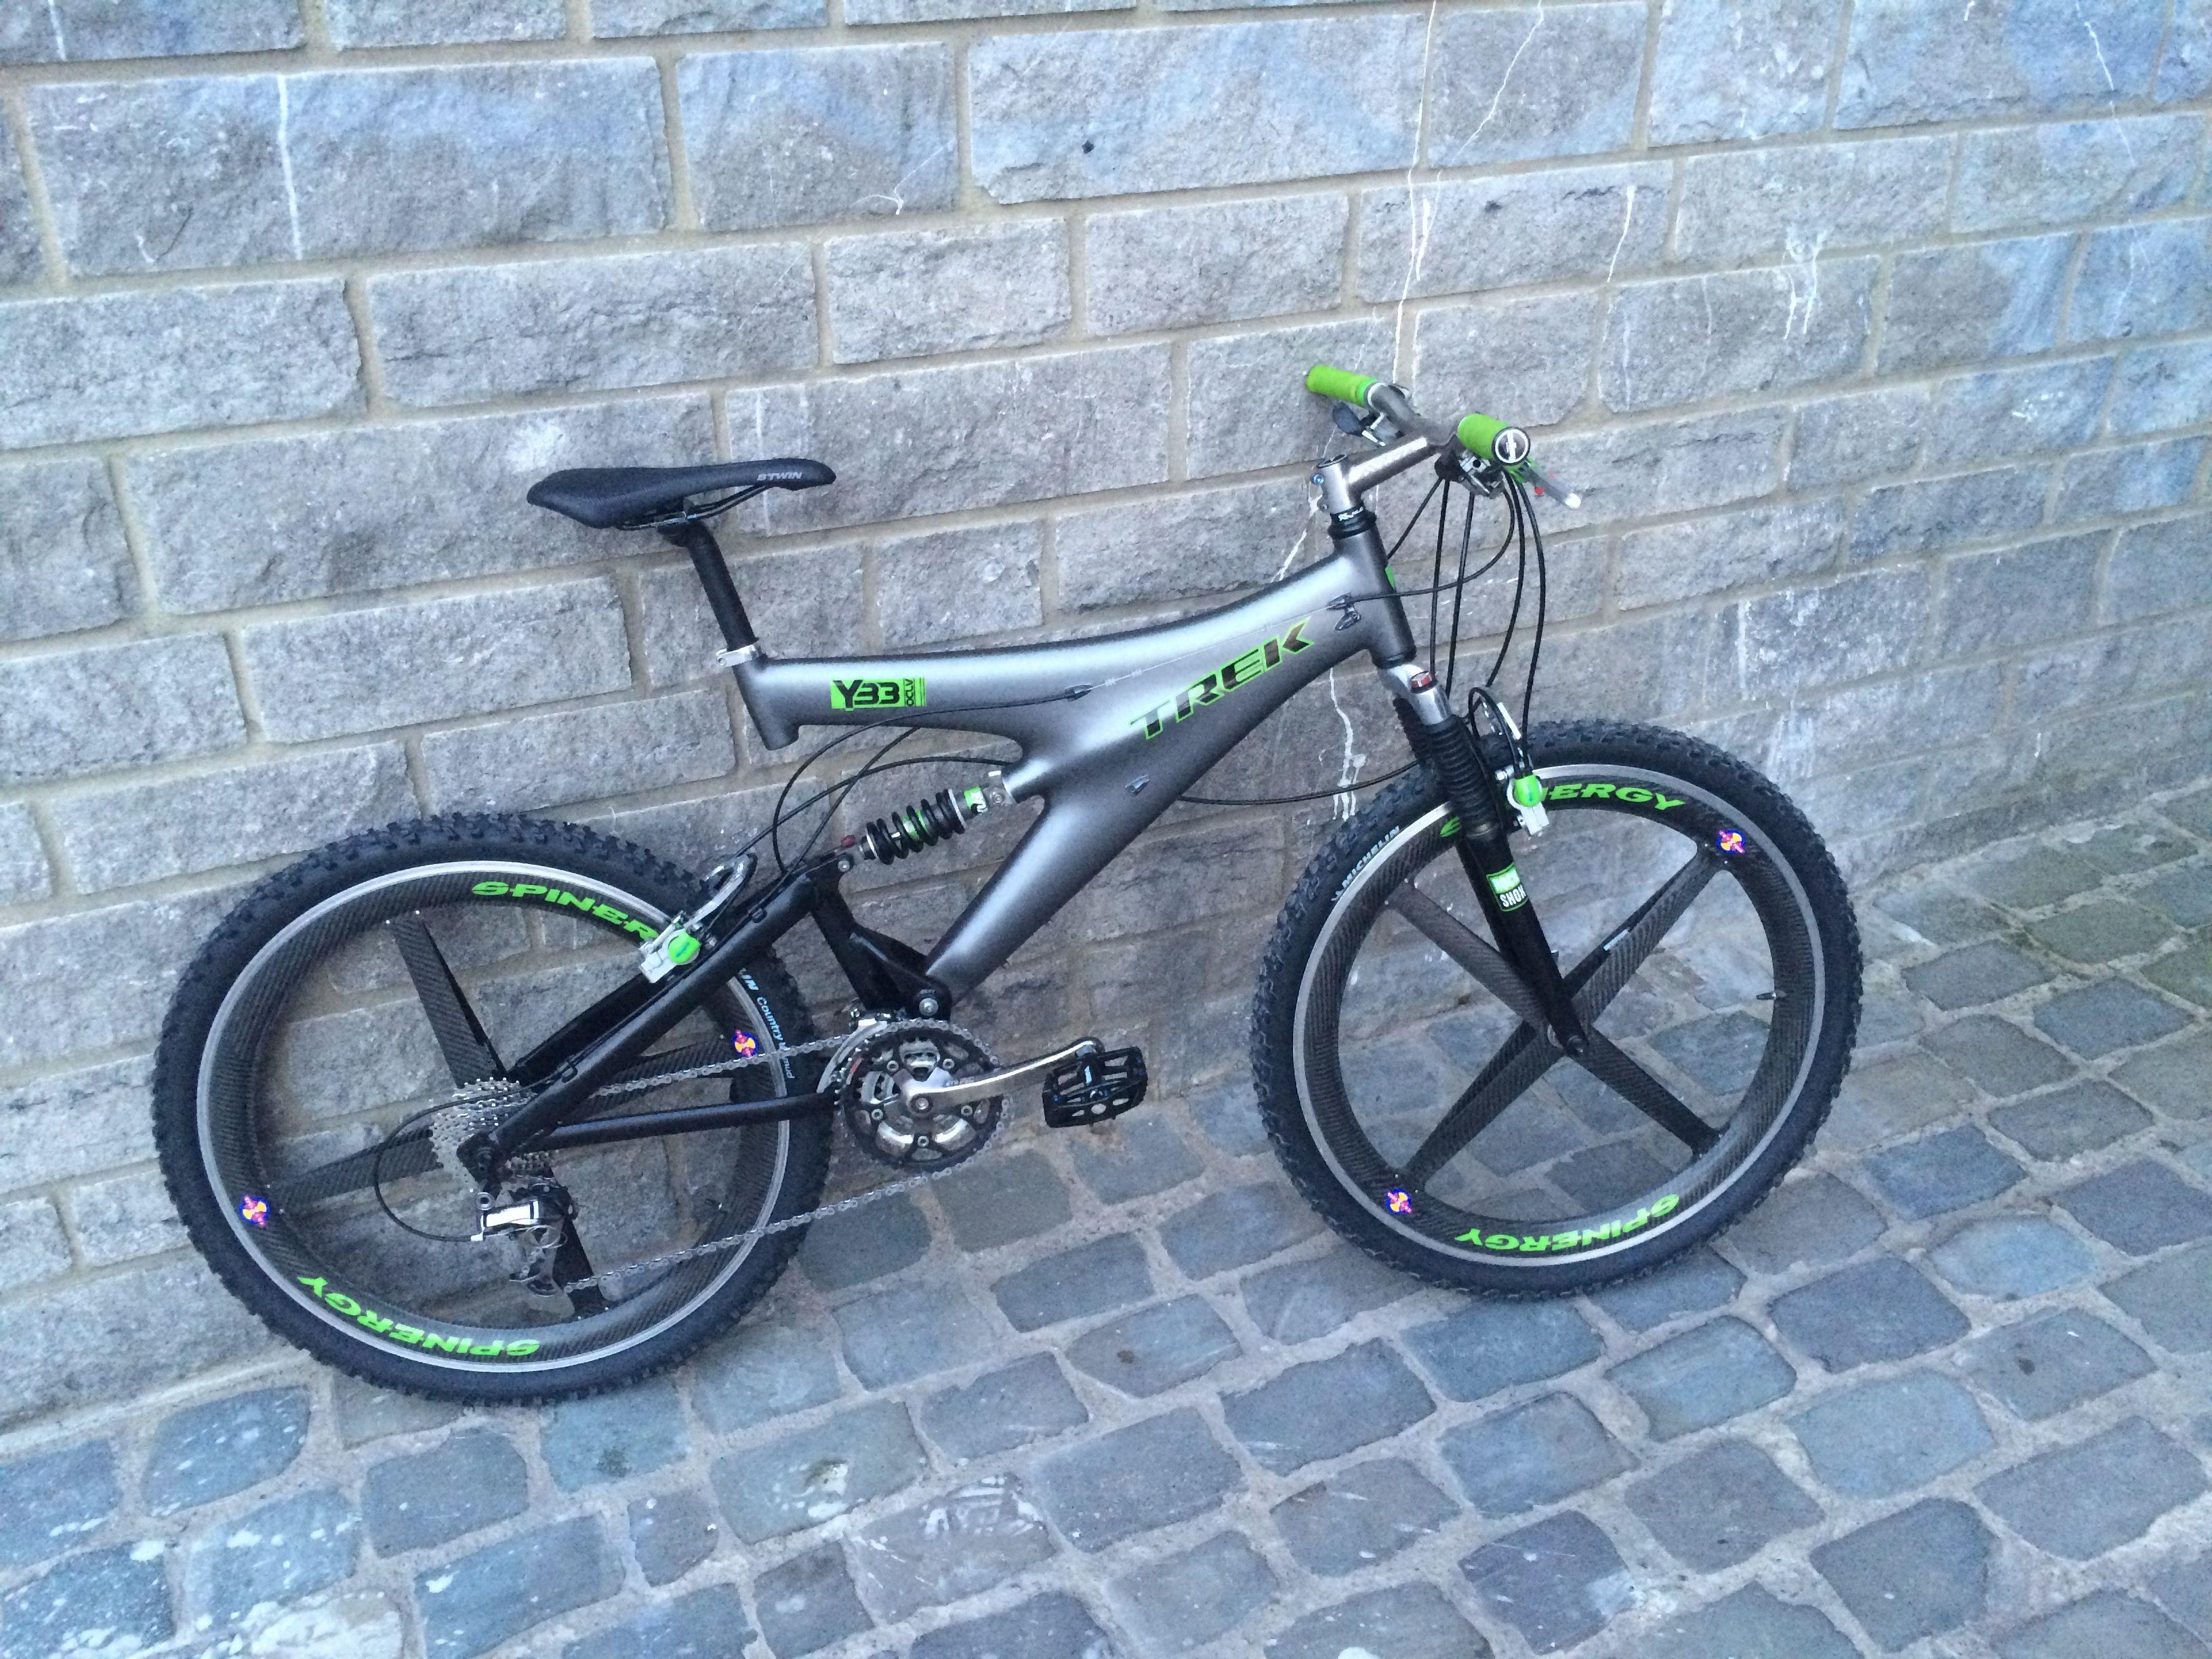 Trek Y 33 Dam S Bike Vintage Mountain Bike Bicycle Design